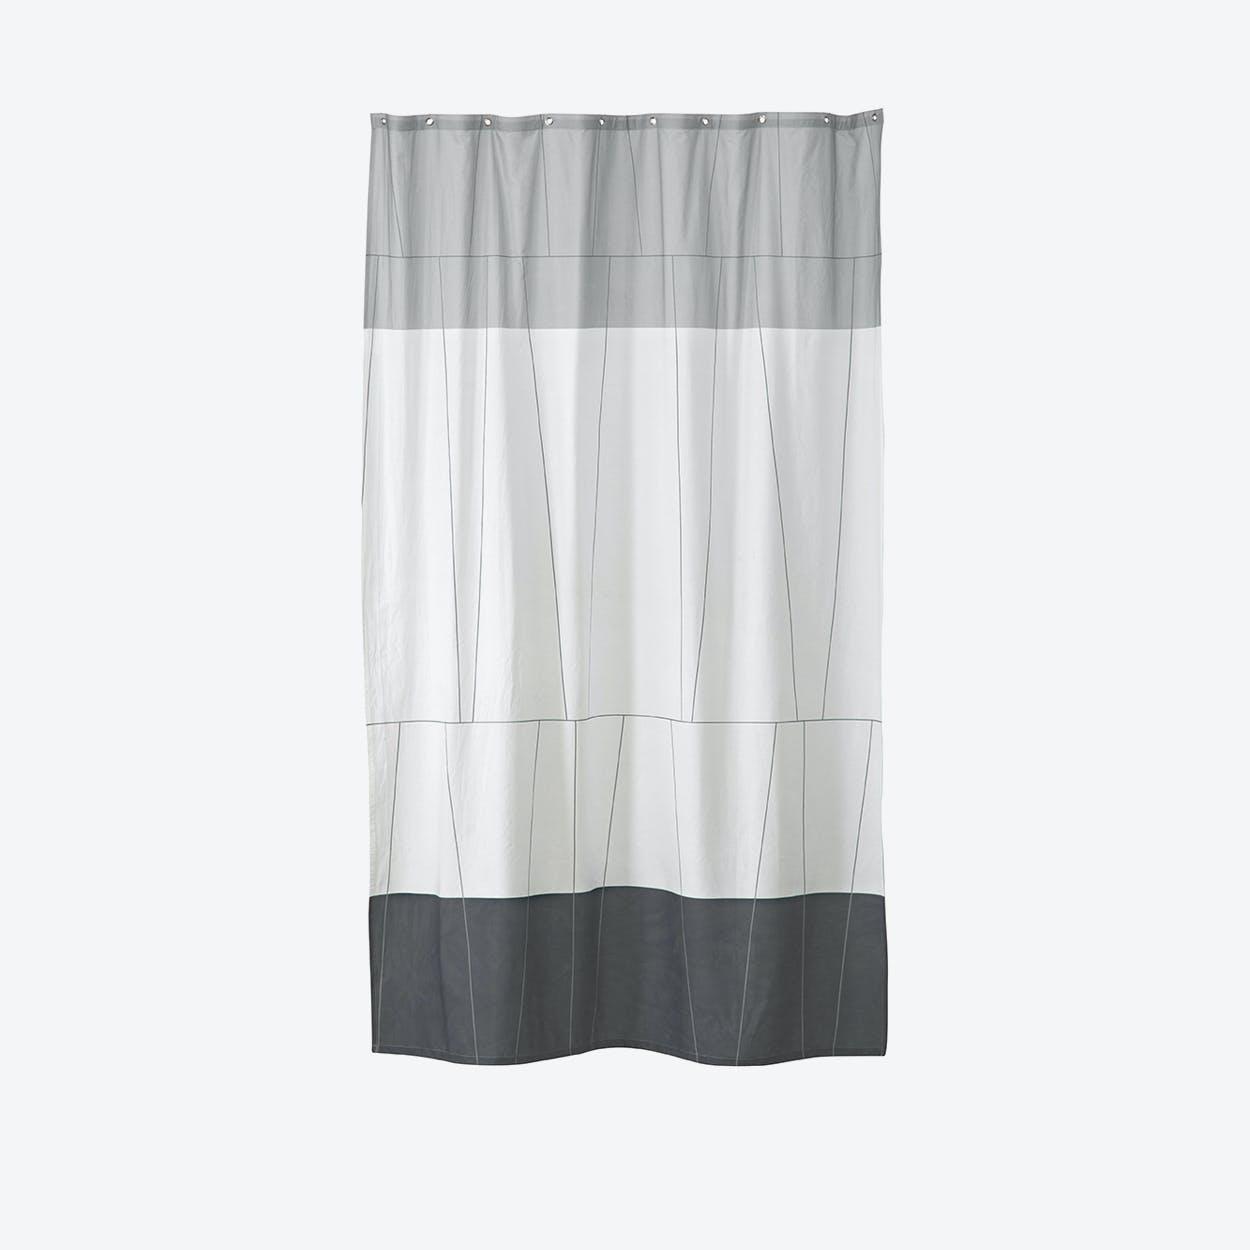 Verdi Shower Curtain in Grey